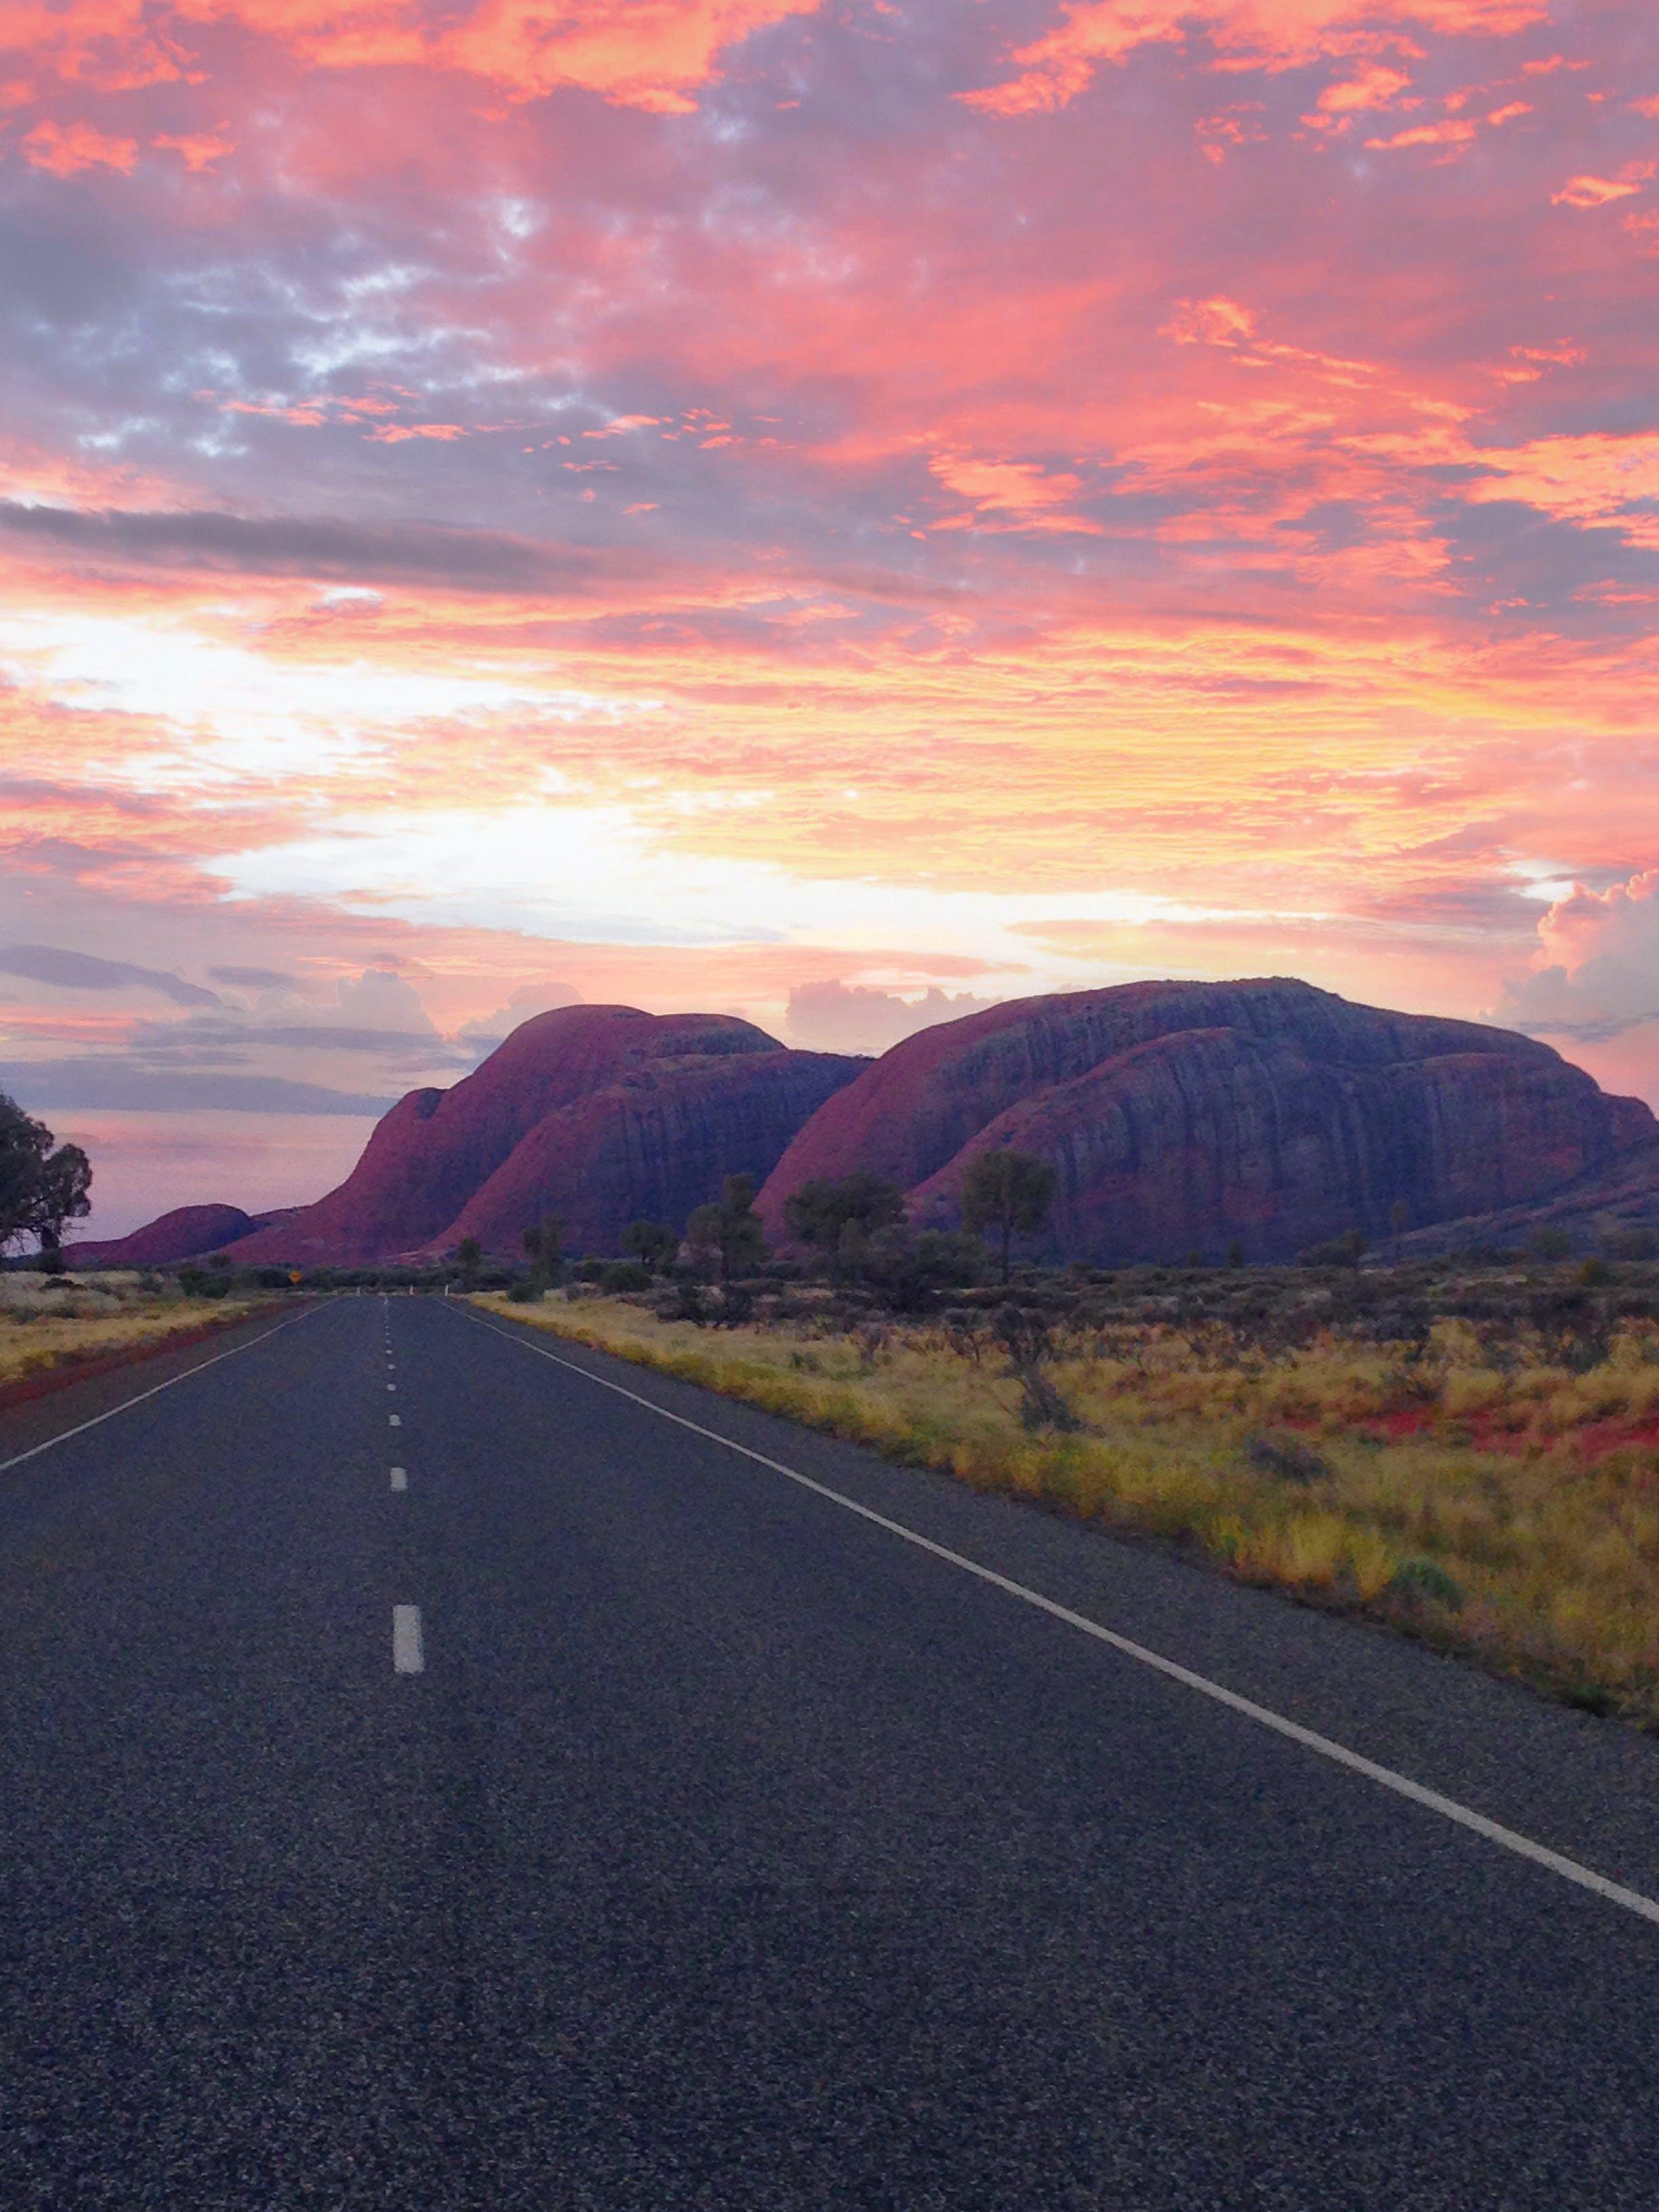 Free stock photo of Kata Tjuta, northern territory, road, sunset